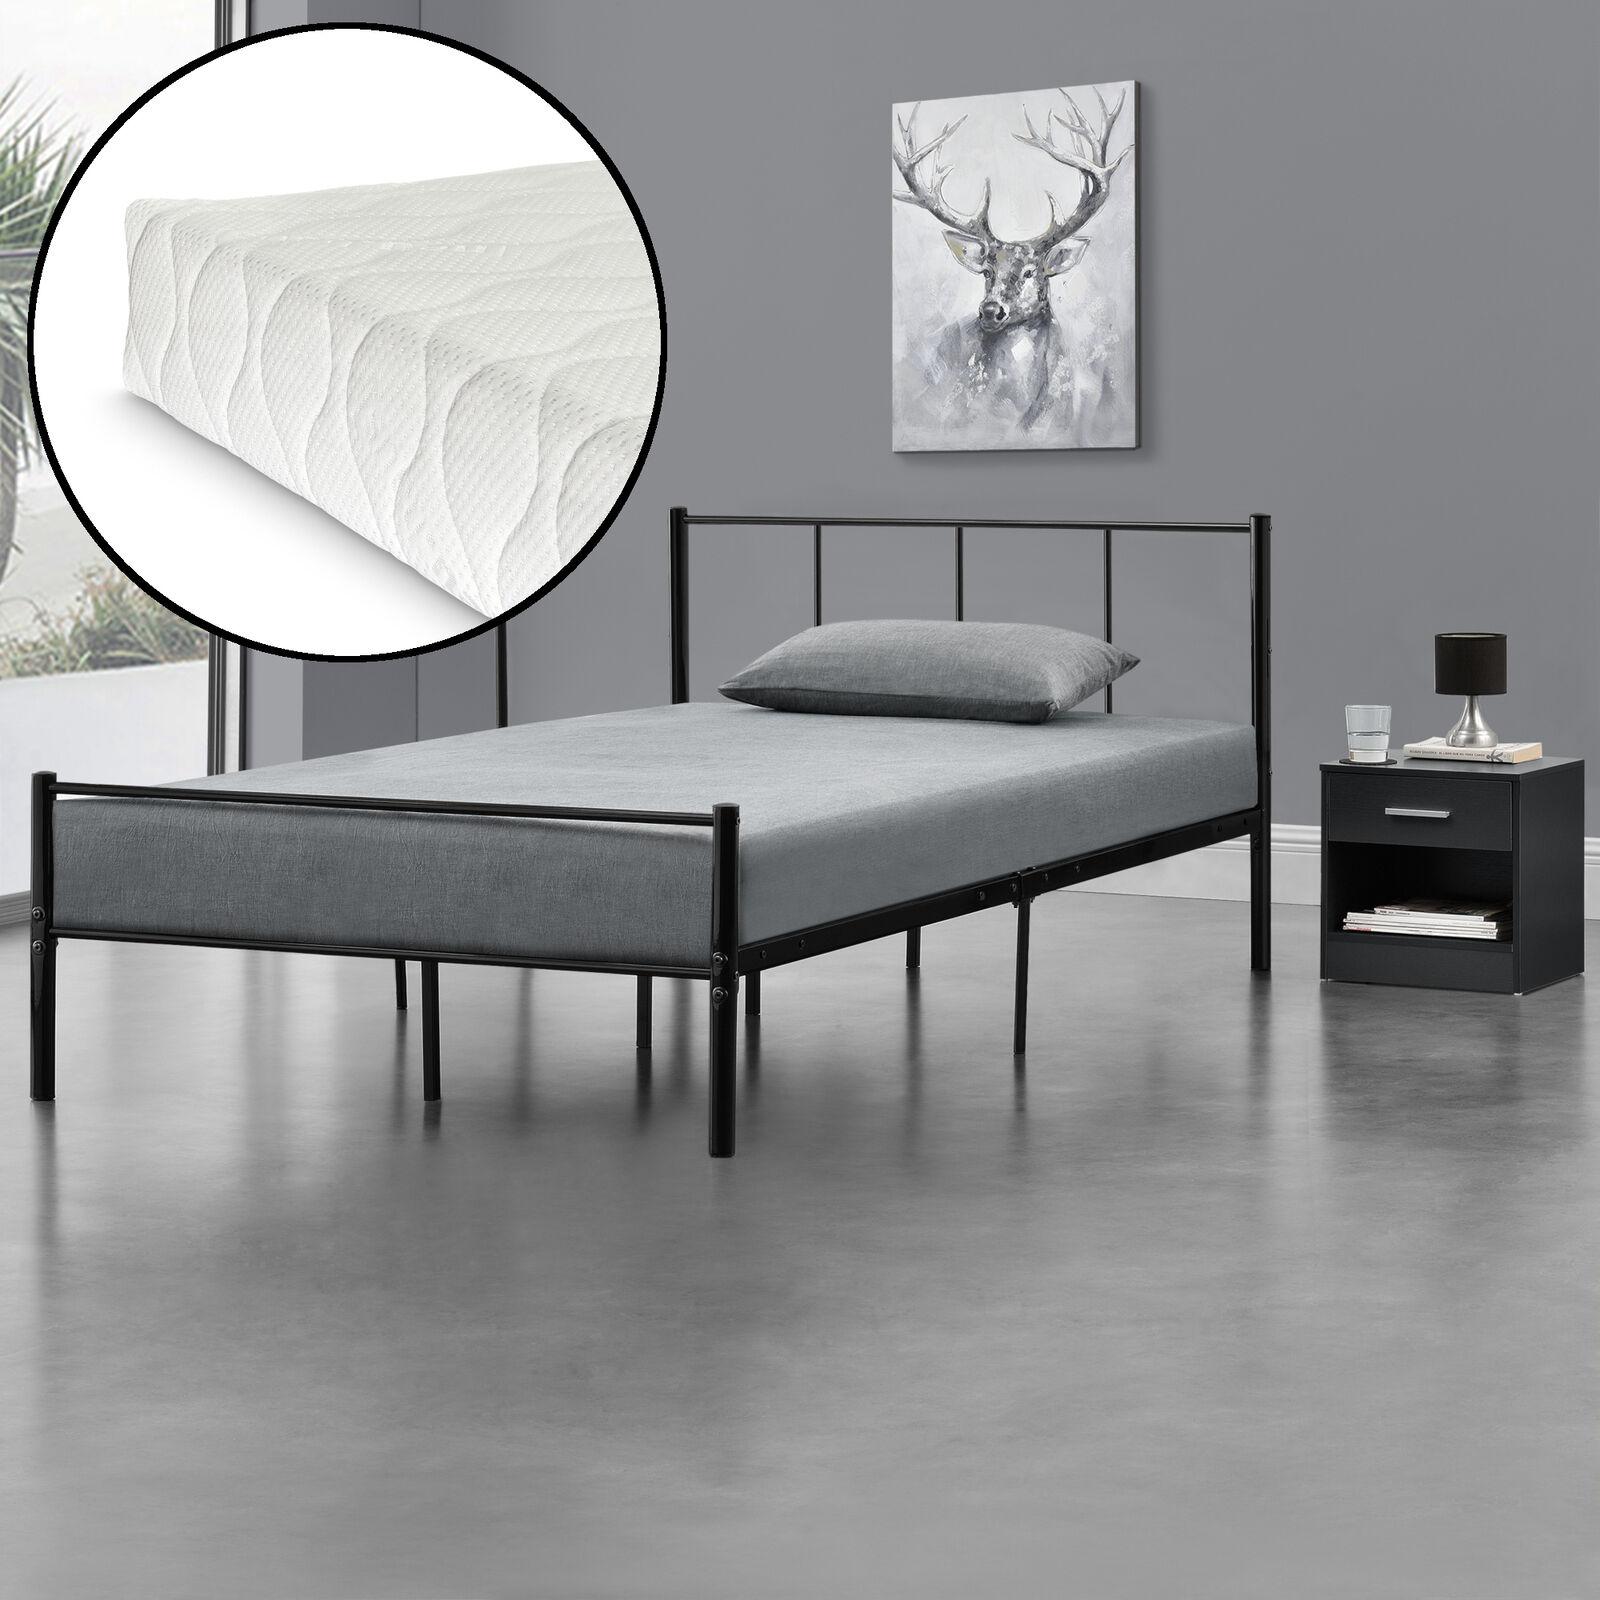 [en.casa] Metallbett 120x200 mit Matratze Schwarz Bettgestell Design Bett Metall